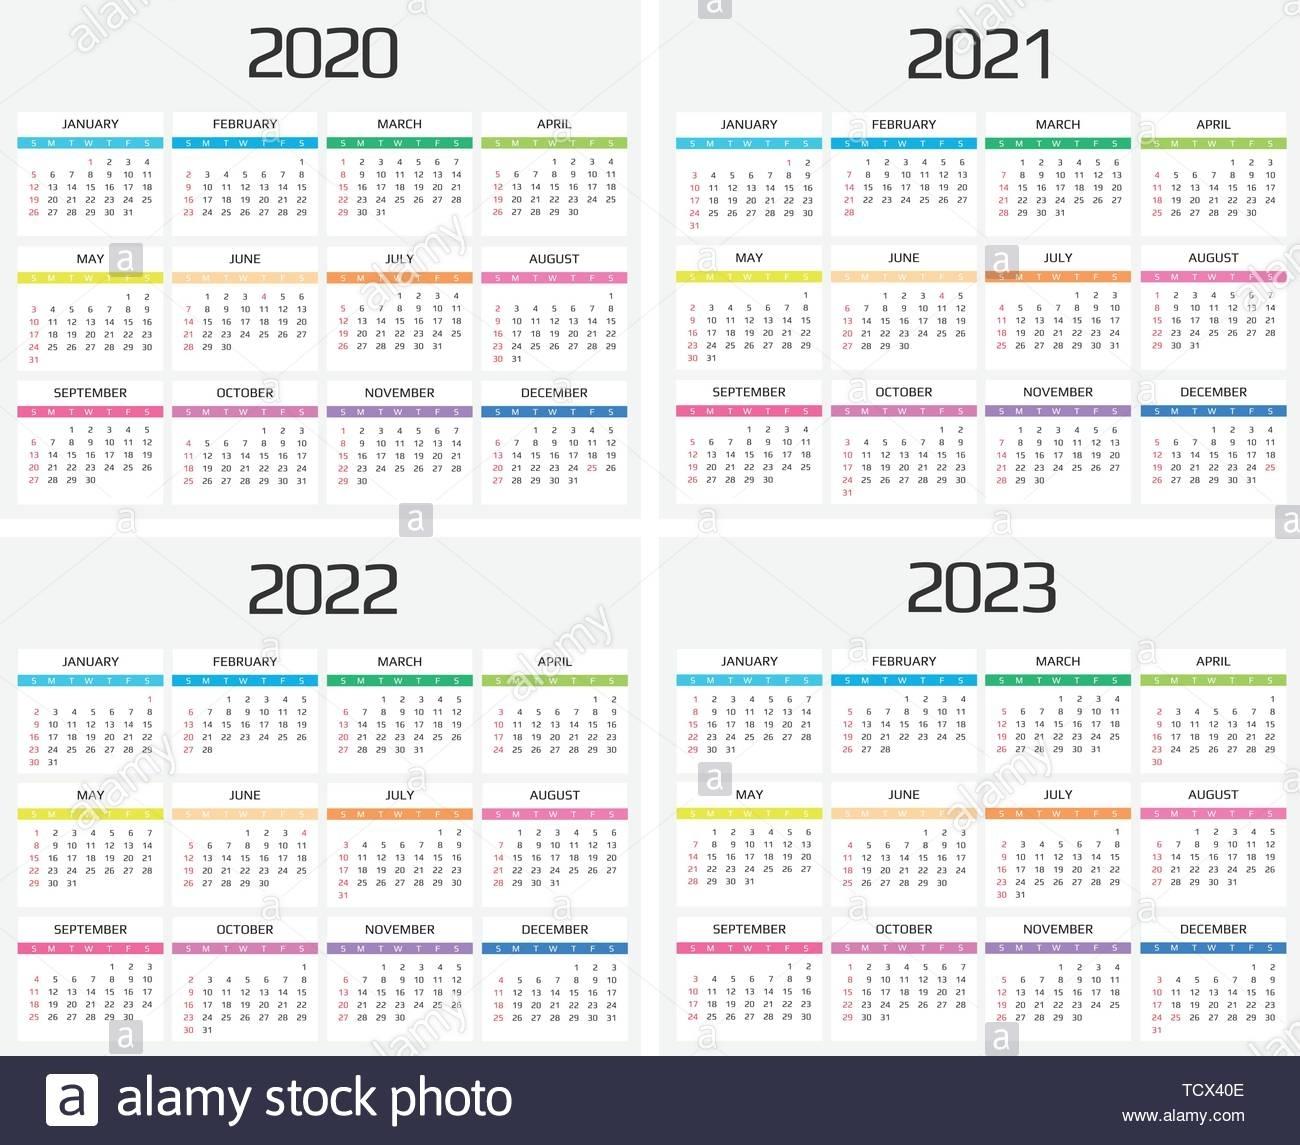 Calendar 2020, 2021, 2022, 2023 Template. 12 Months. Include pertaining to 2020 2021 2022 2023 Calendar